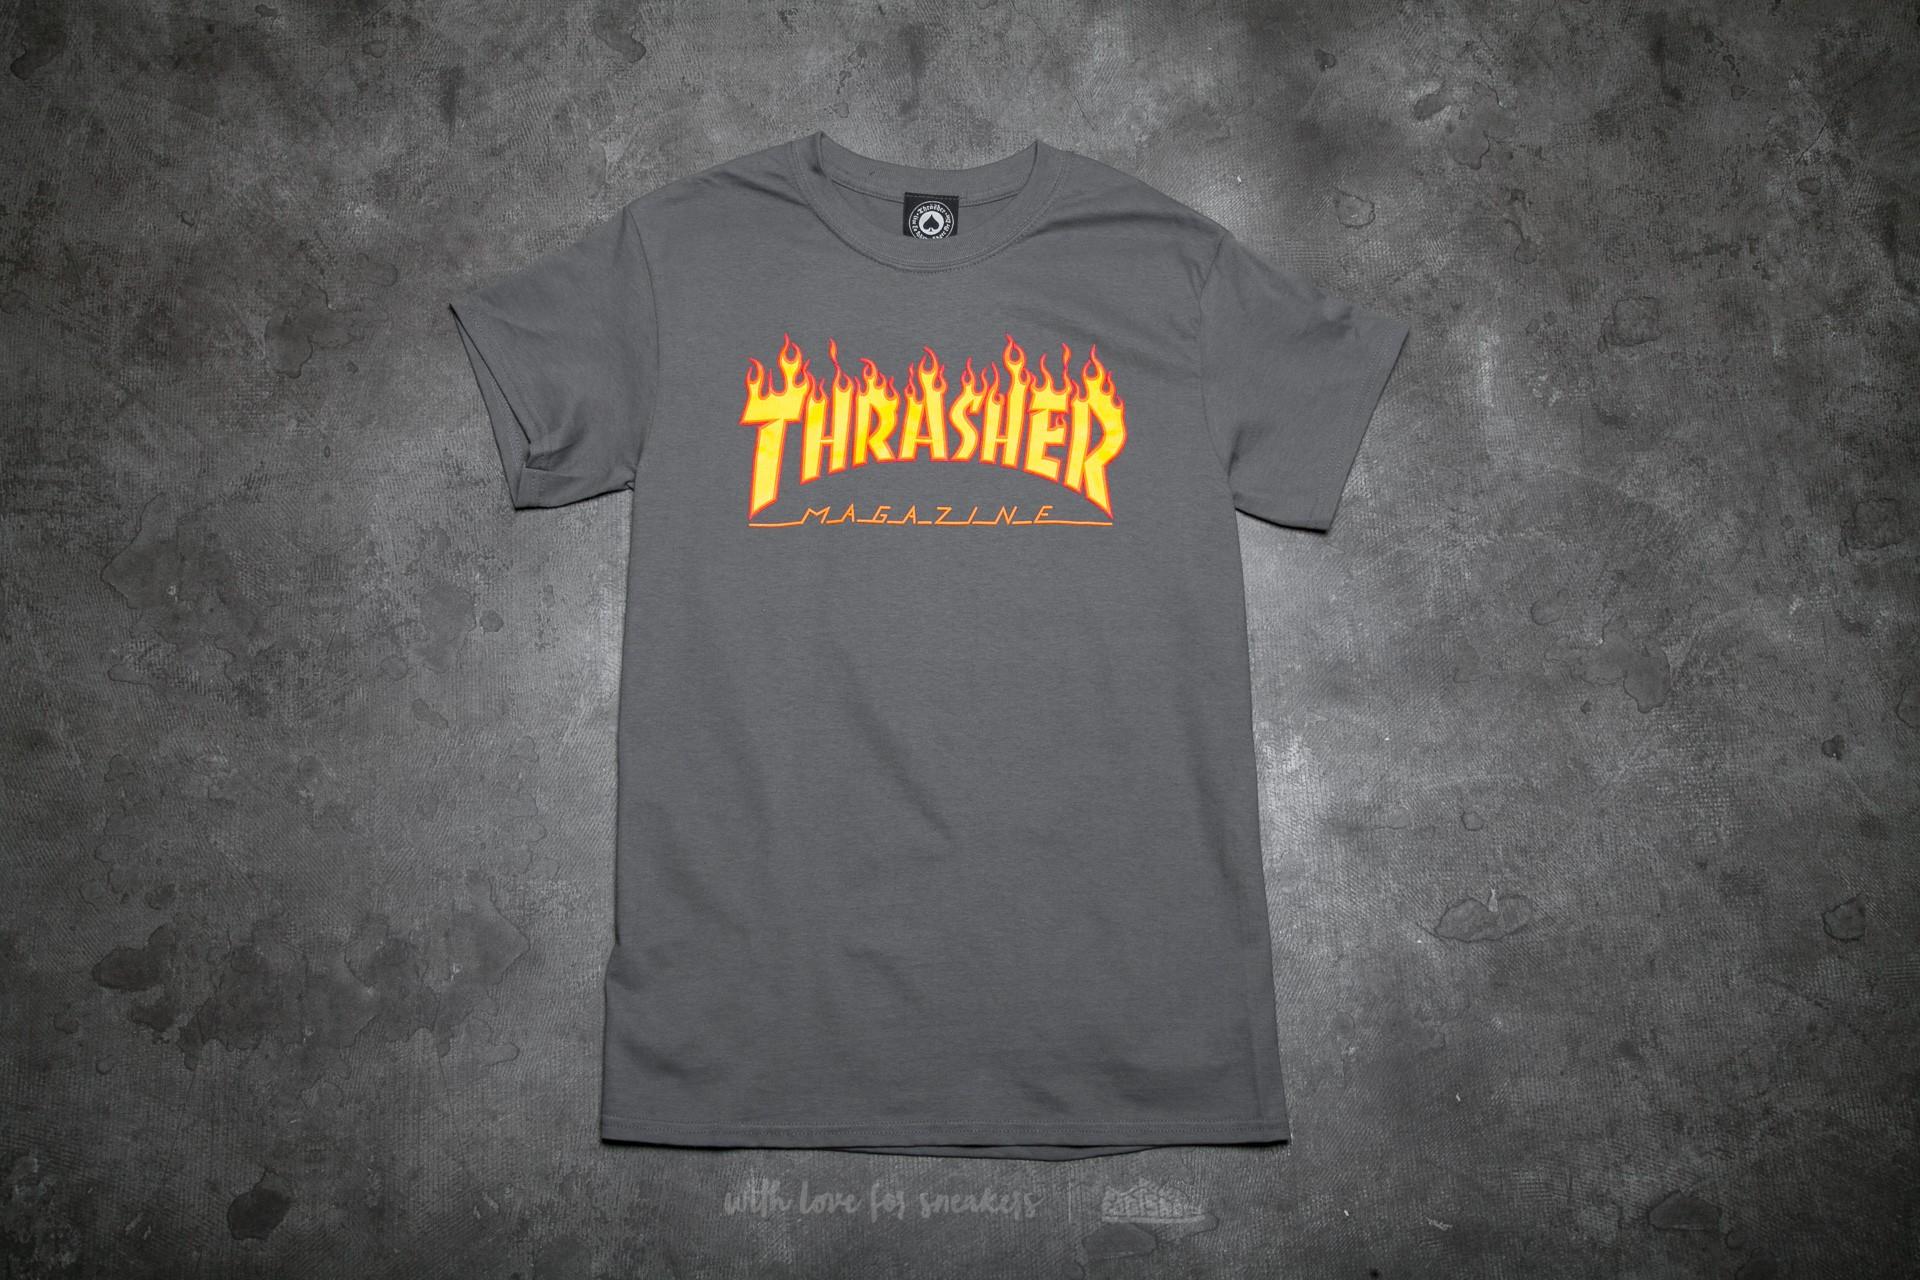 ea9e16f0b3f Thrasher Flame Logo T-Shirt Charcoal Gray